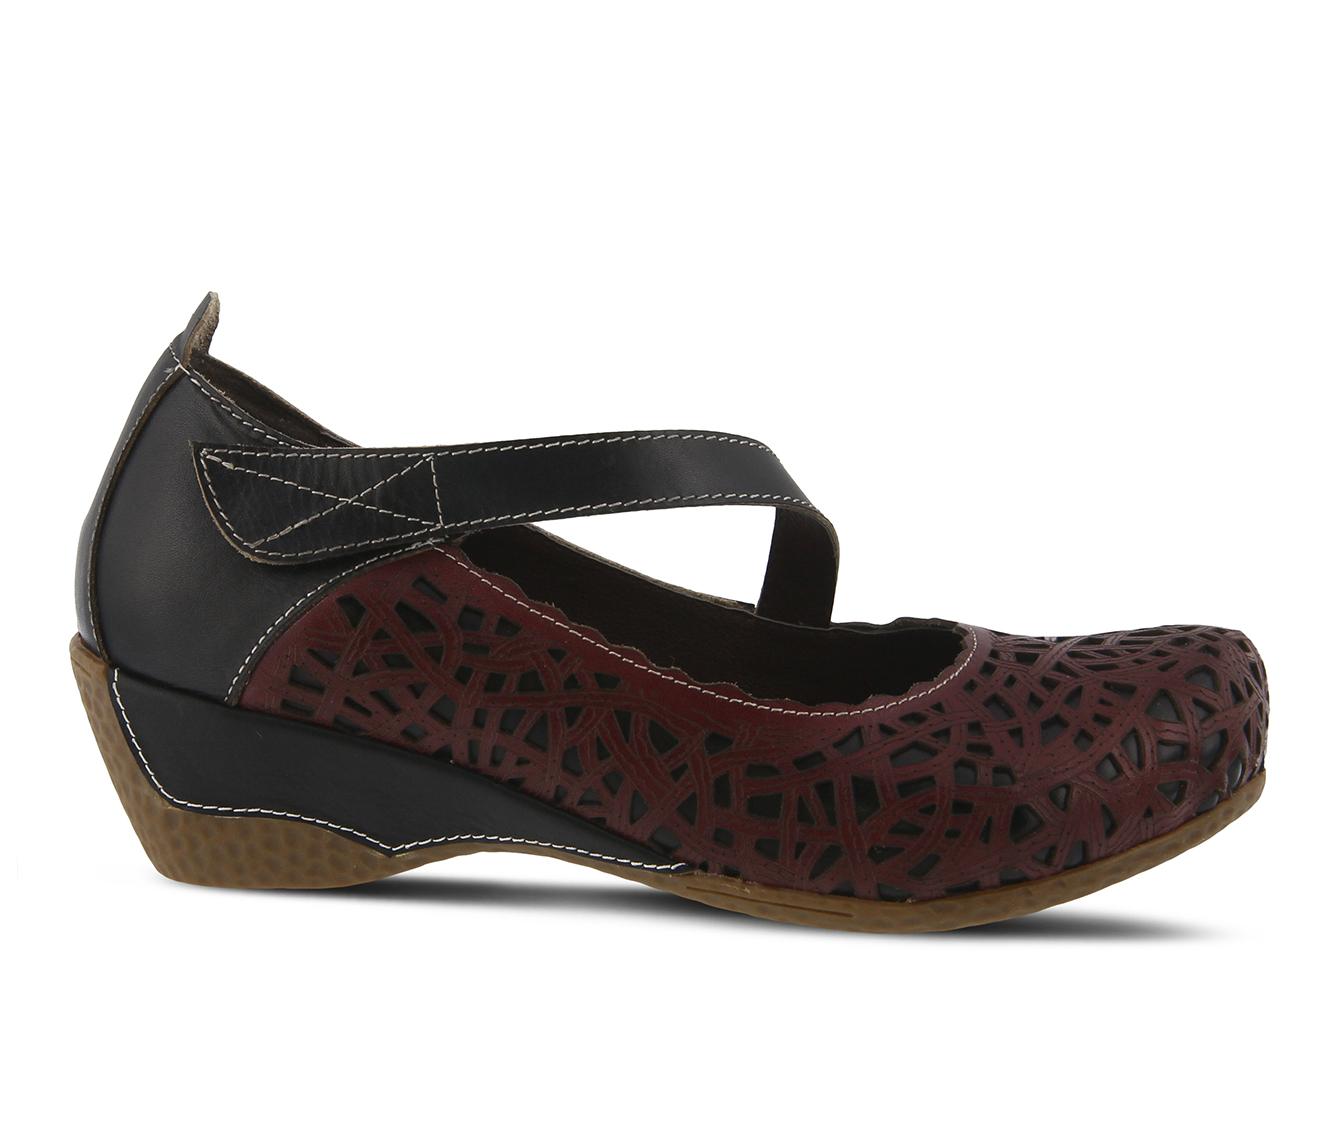 L'Artiste Melinda Women's Shoe (Black Leather)